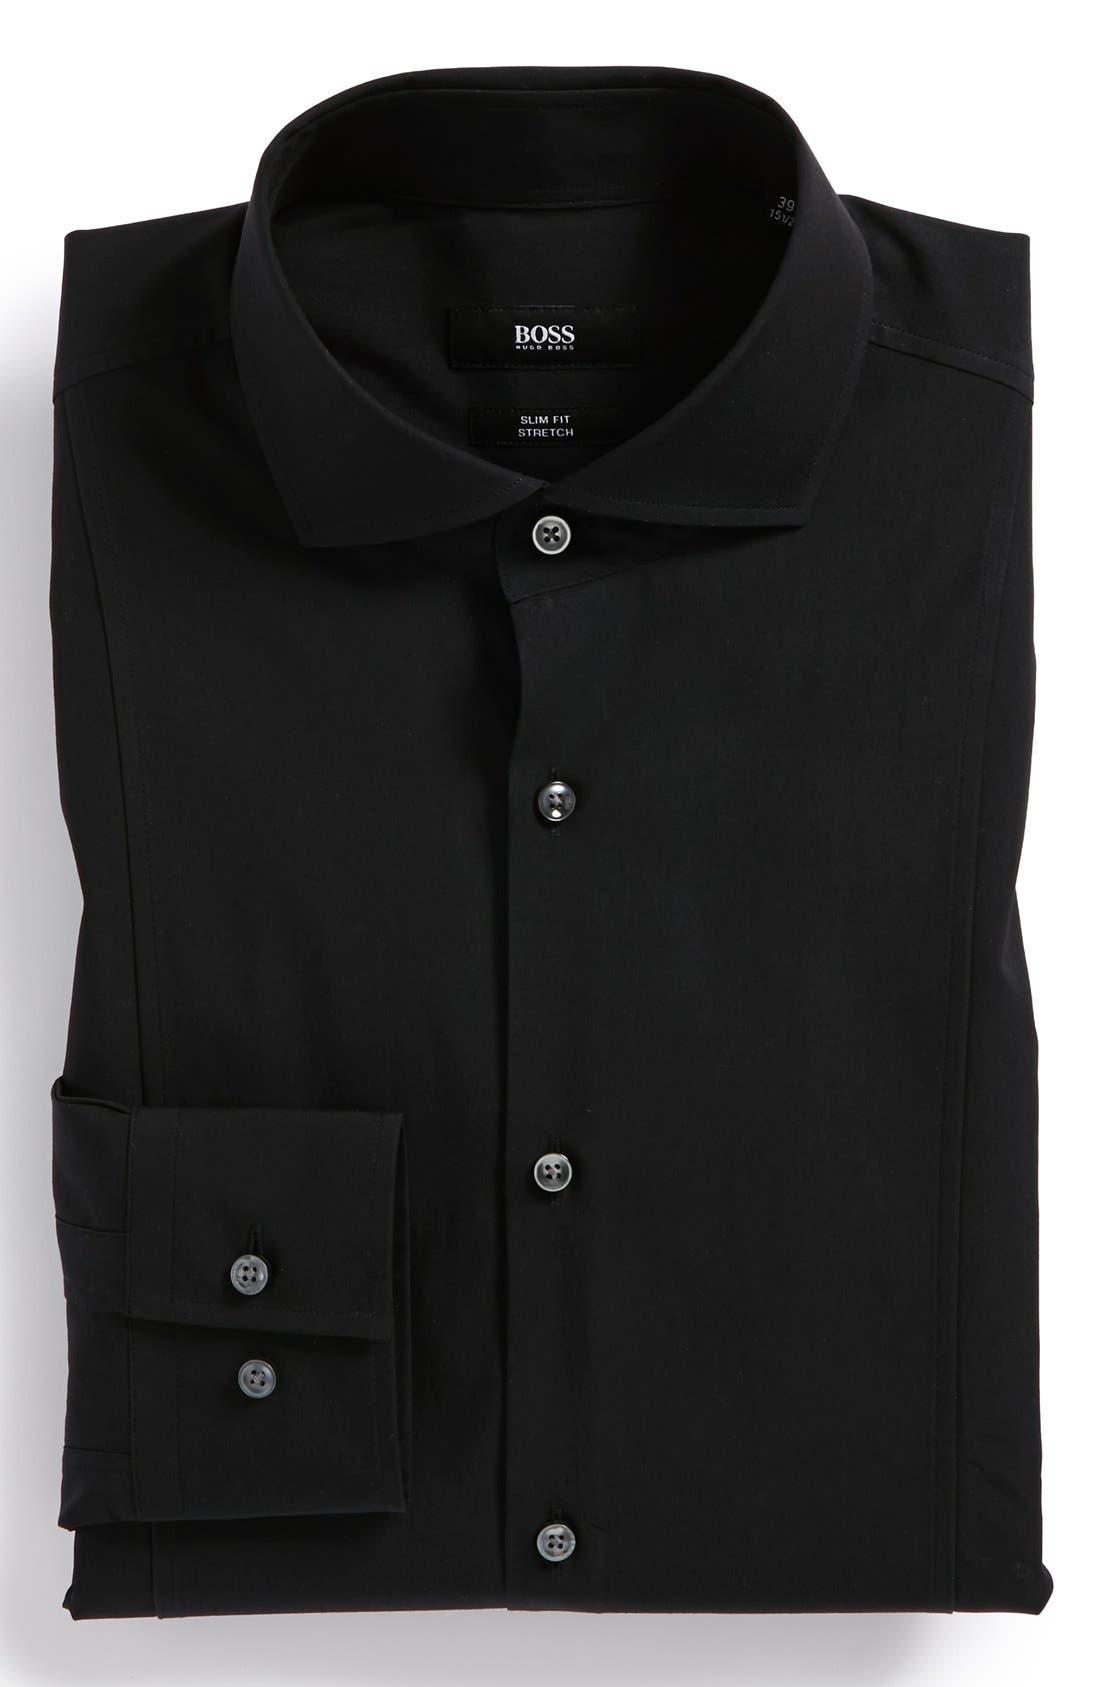 Main Image - BOSS HUGO BOSS 'Philip' Slim Fit Stretch Dress Shirt